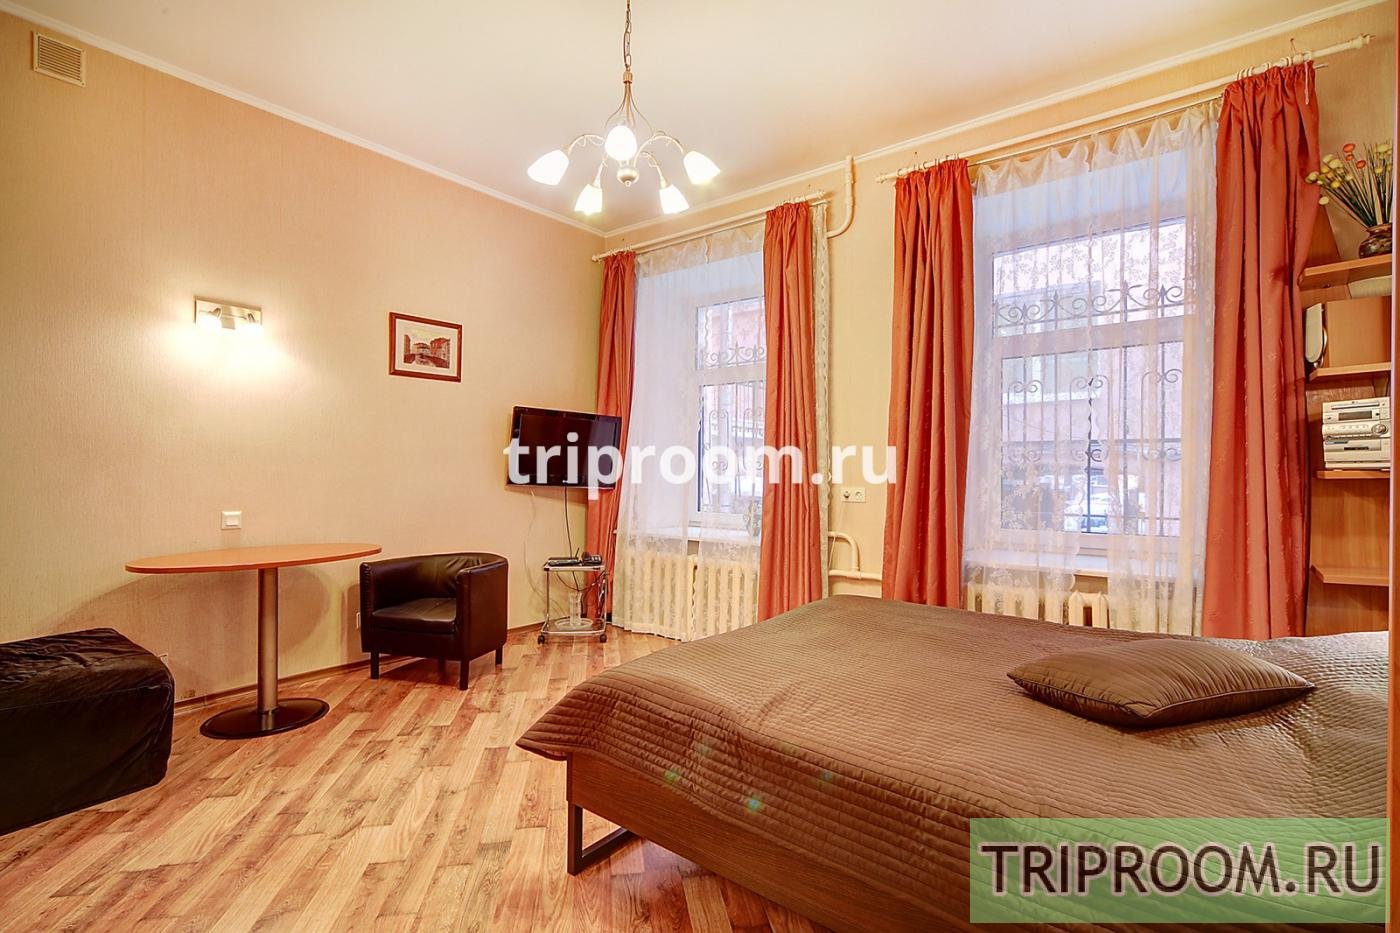 1-комнатная квартира посуточно (вариант № 15082), ул. Невский проспект, фото № 2